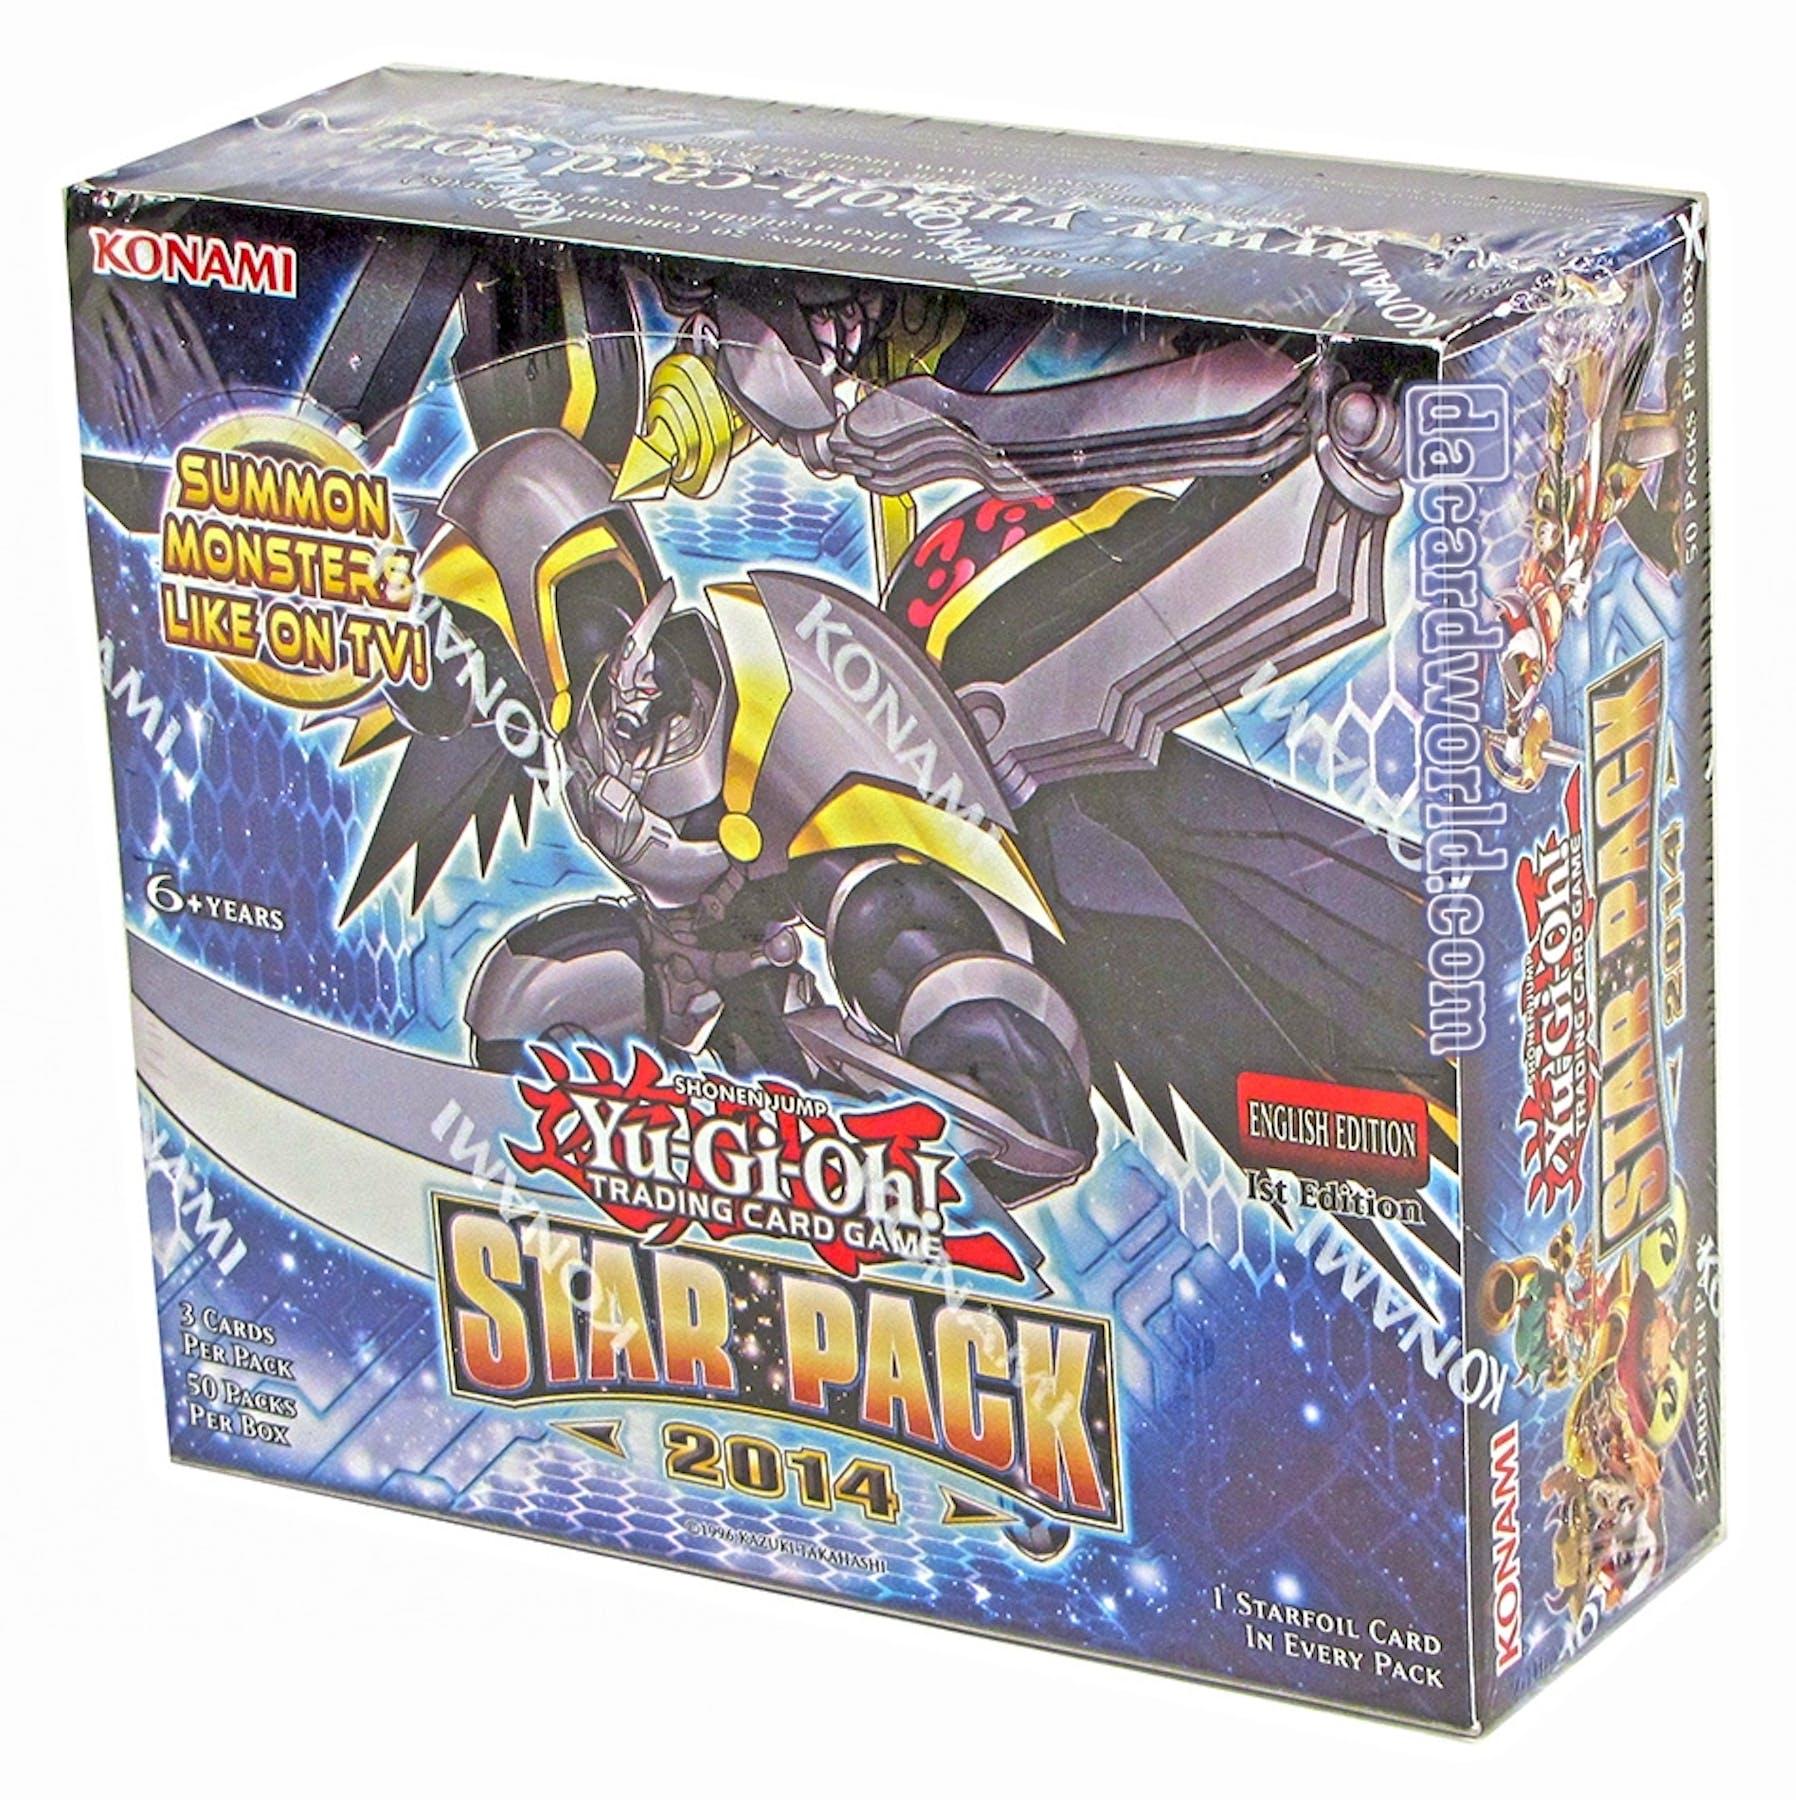 Konami Yu-Gi-Oh Star Pack 2 Booster Box